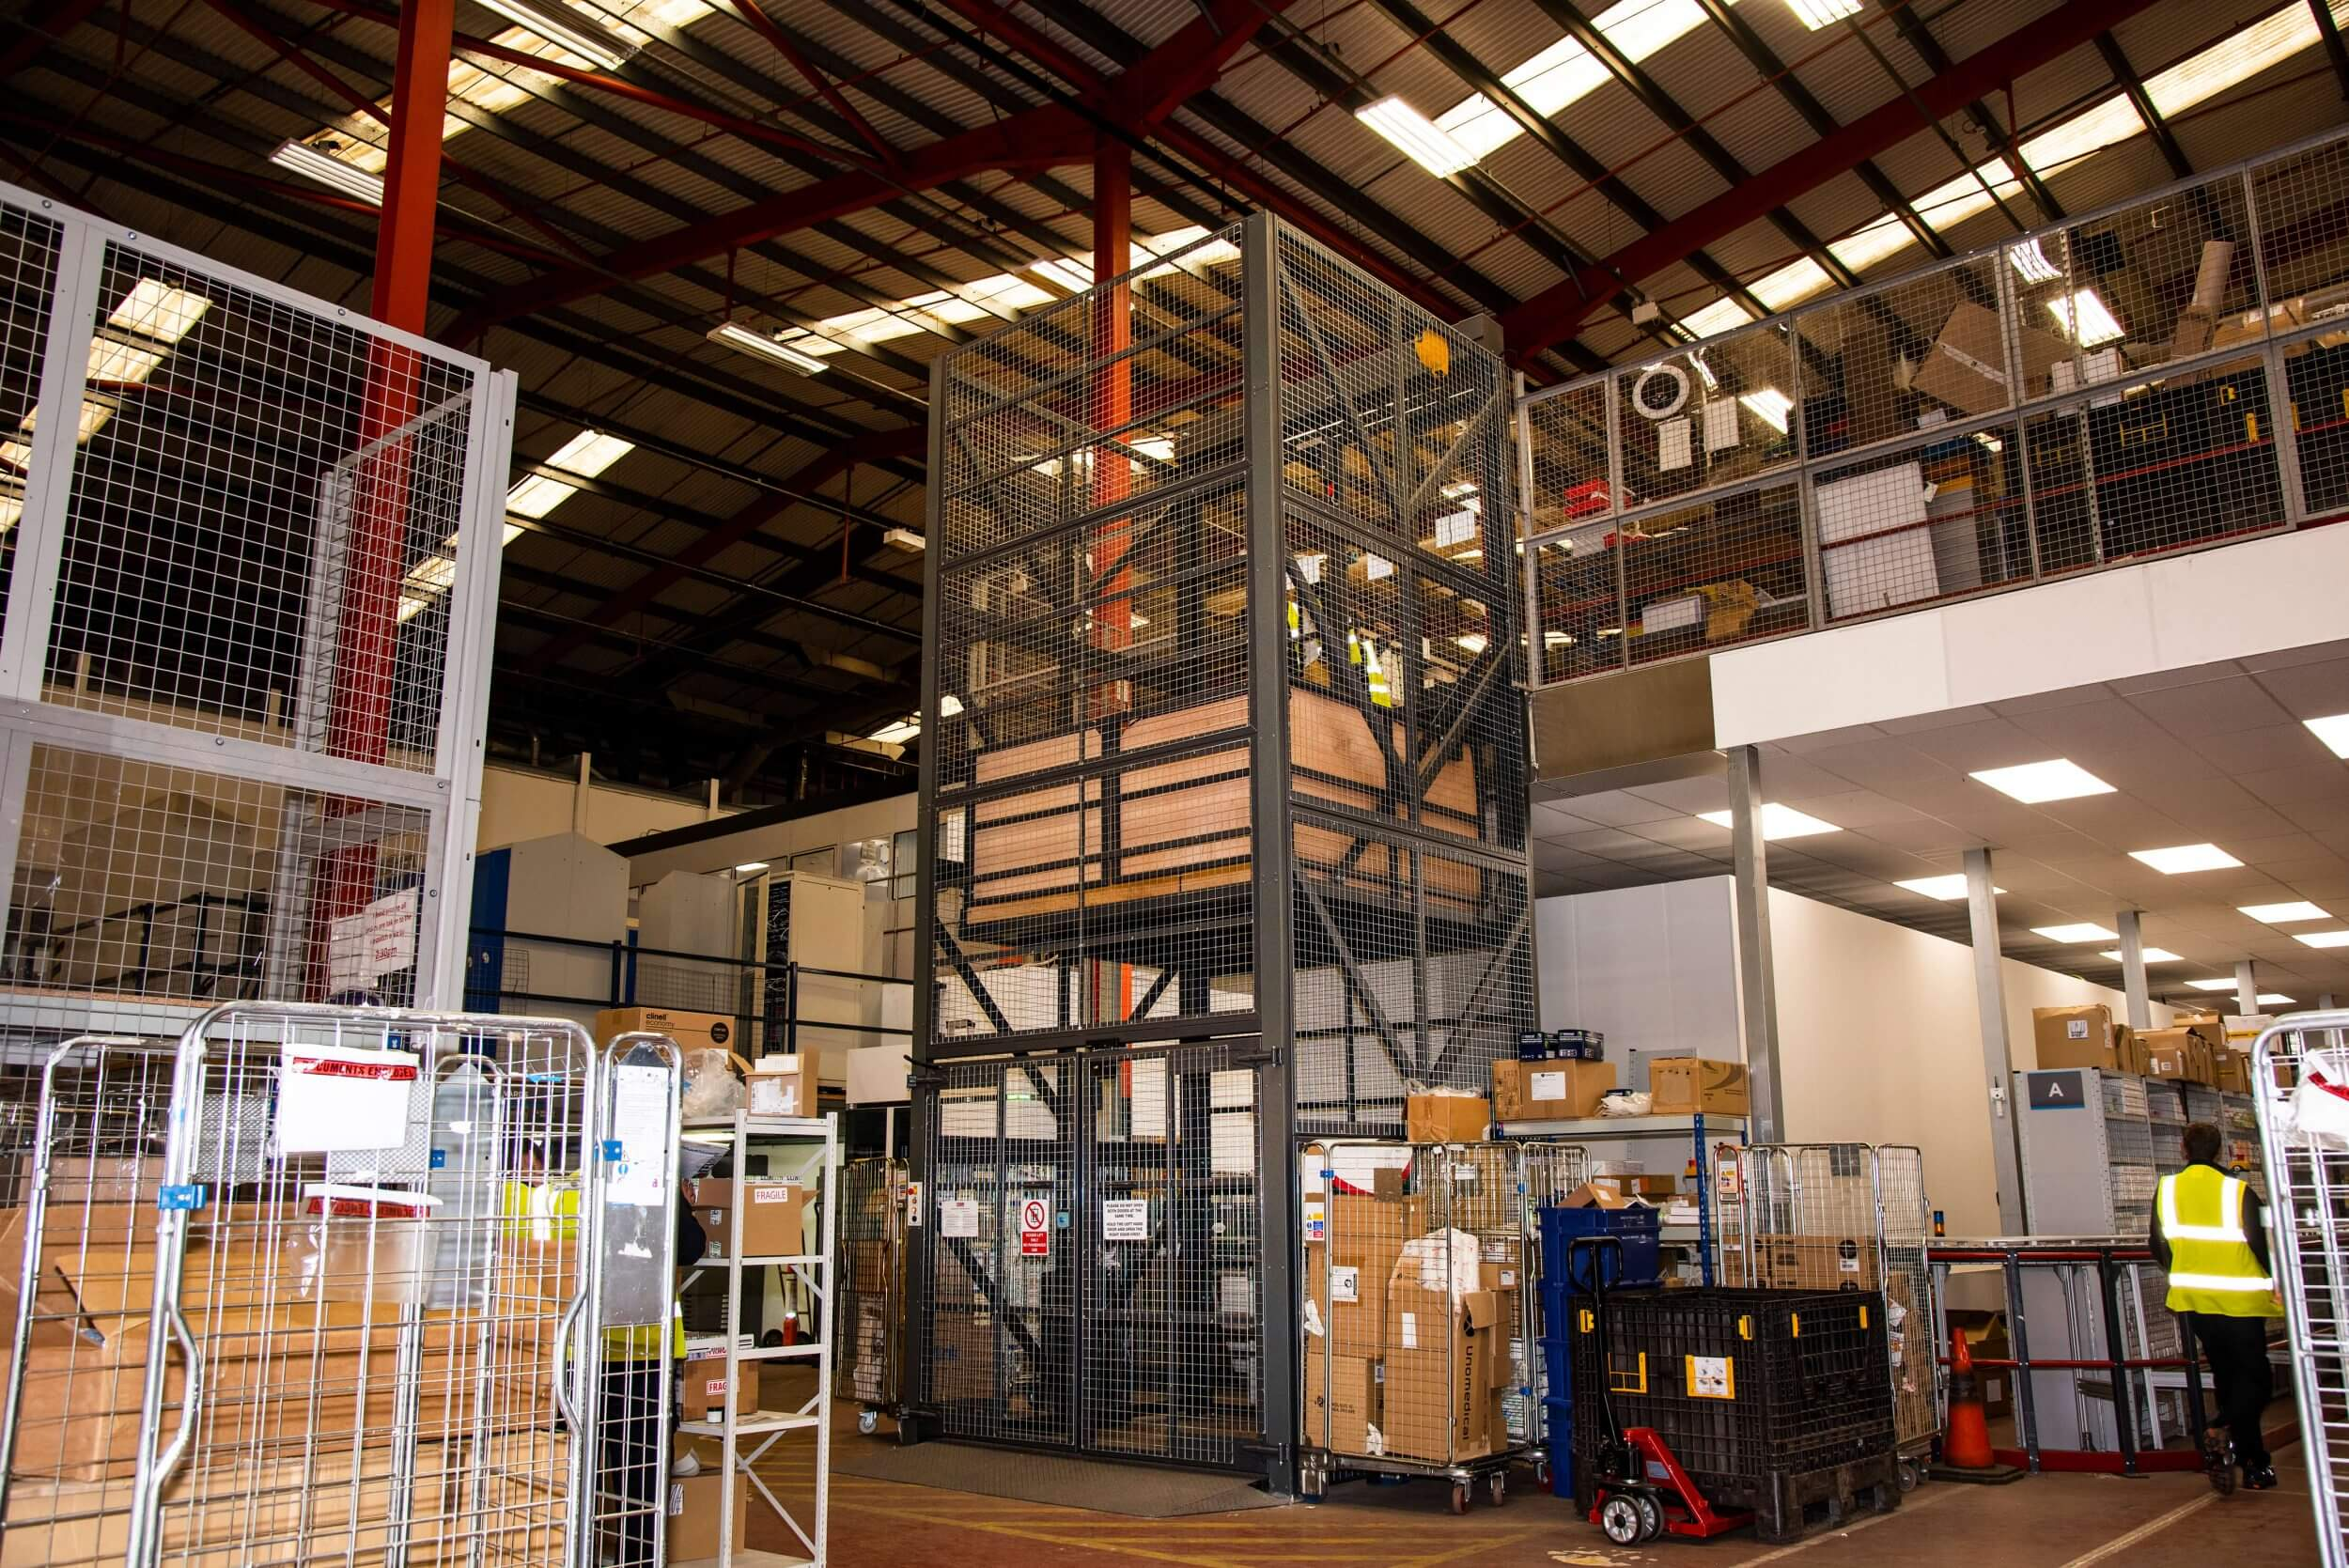 Mezzanine goods lift in use